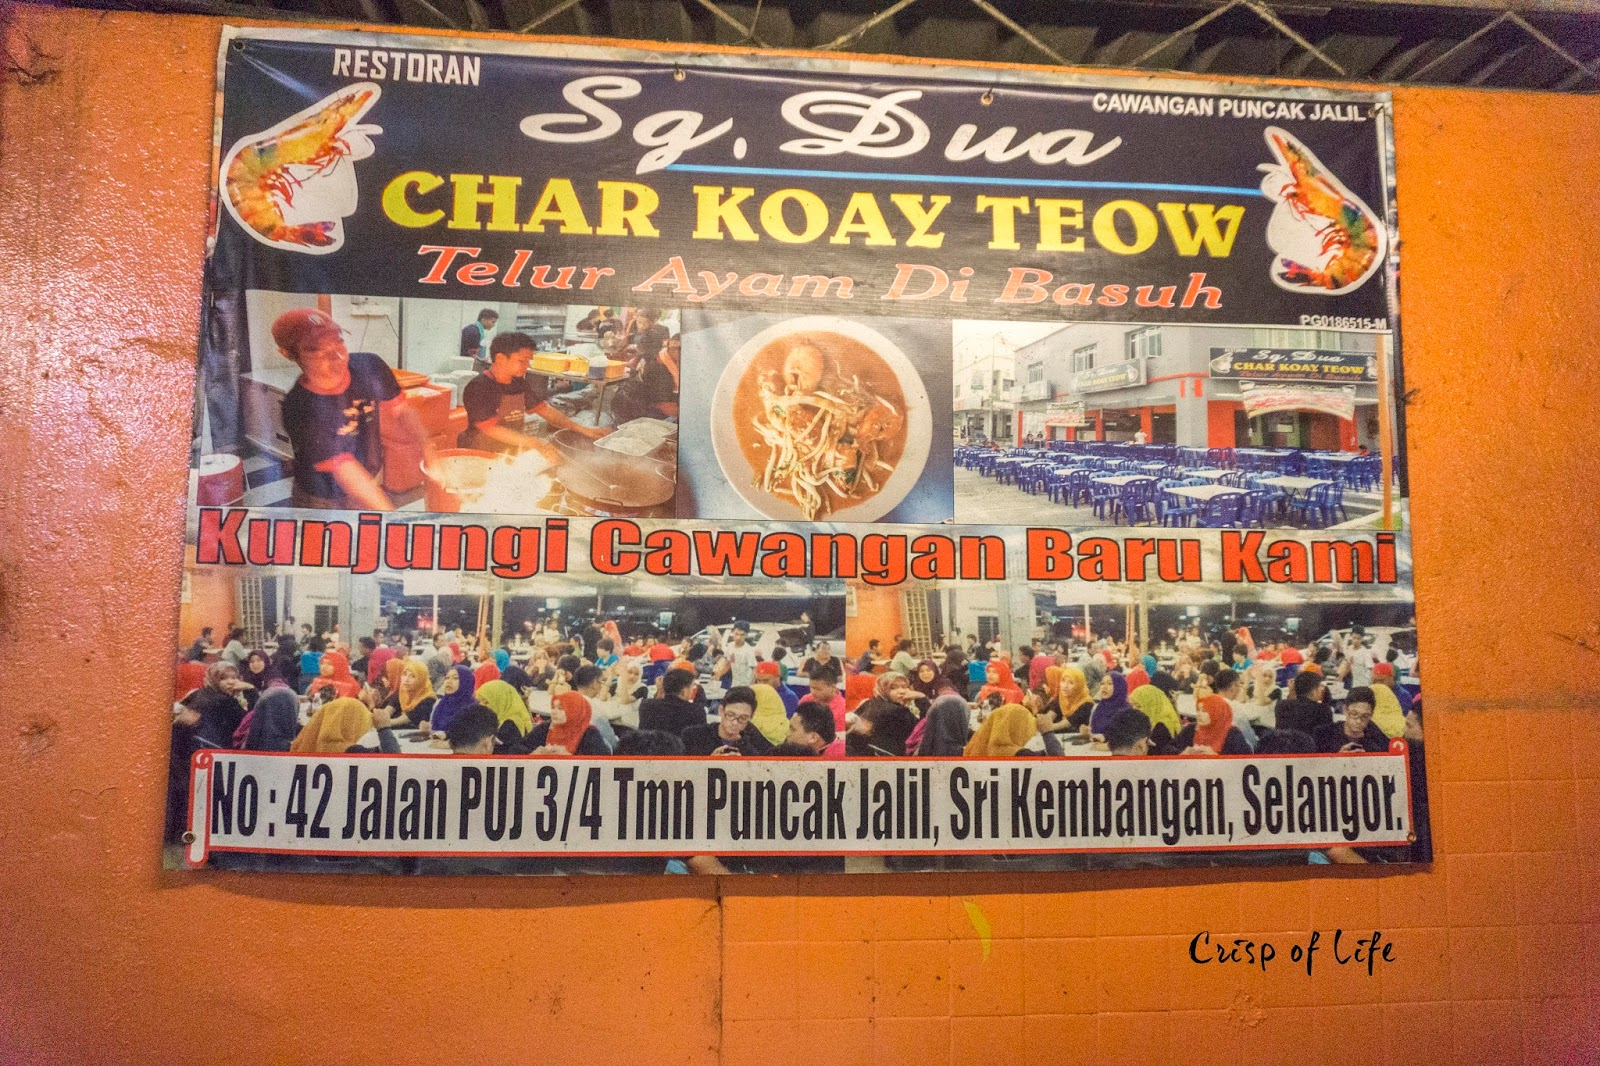 Sungai Dua Char Koay Teow Penang Butterworth Mainland